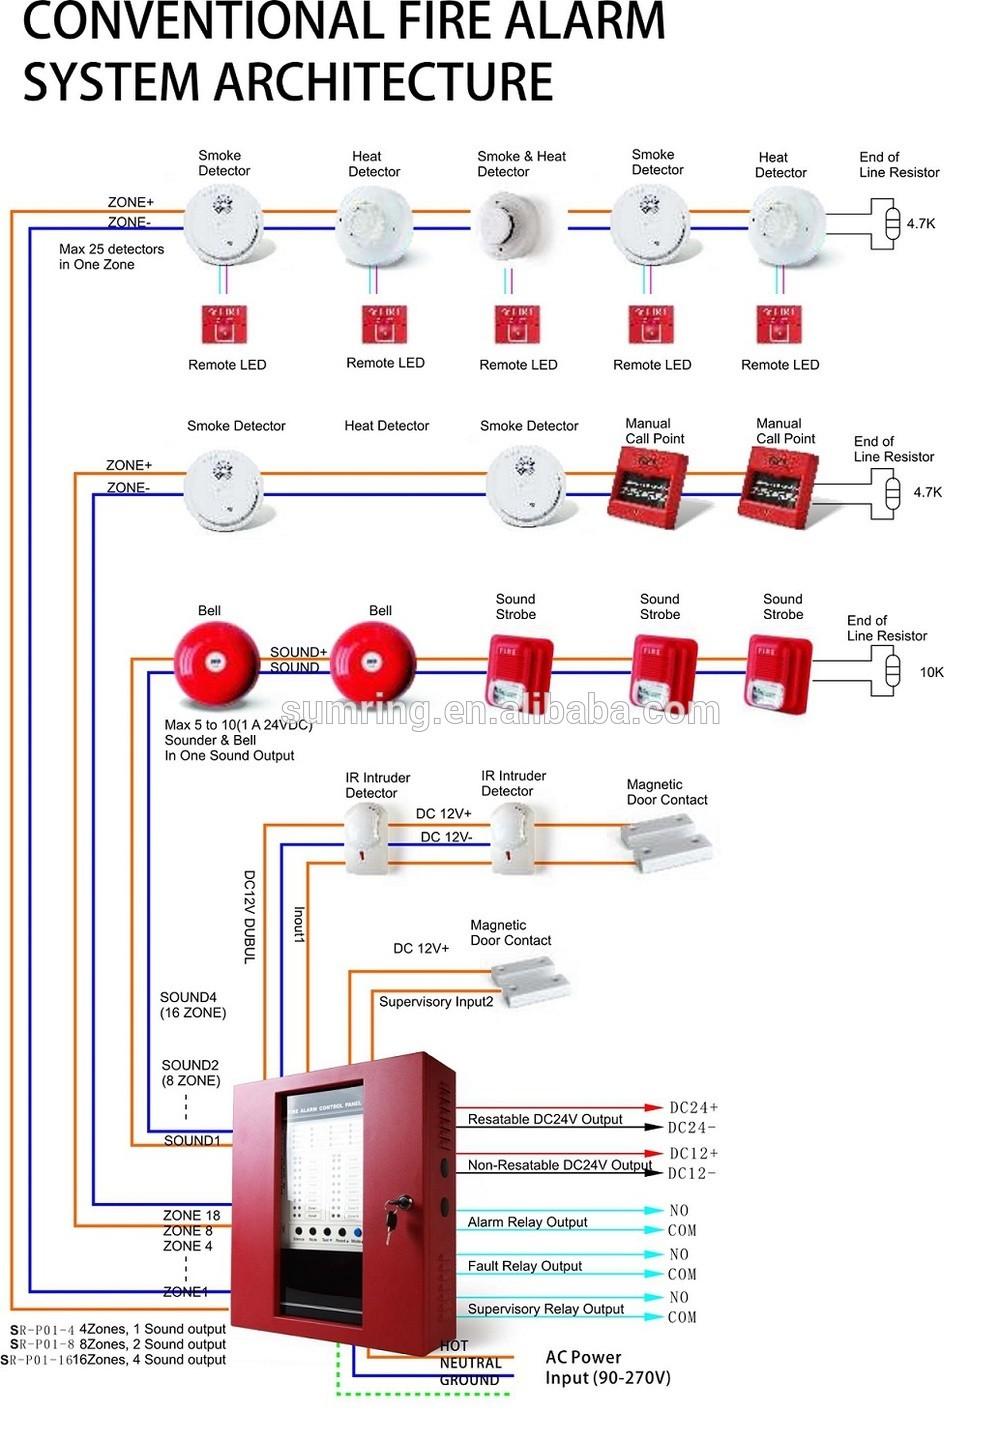 Sn 2346 Fire Alarm System Wiring Diagram On Fire Alarm Schematic